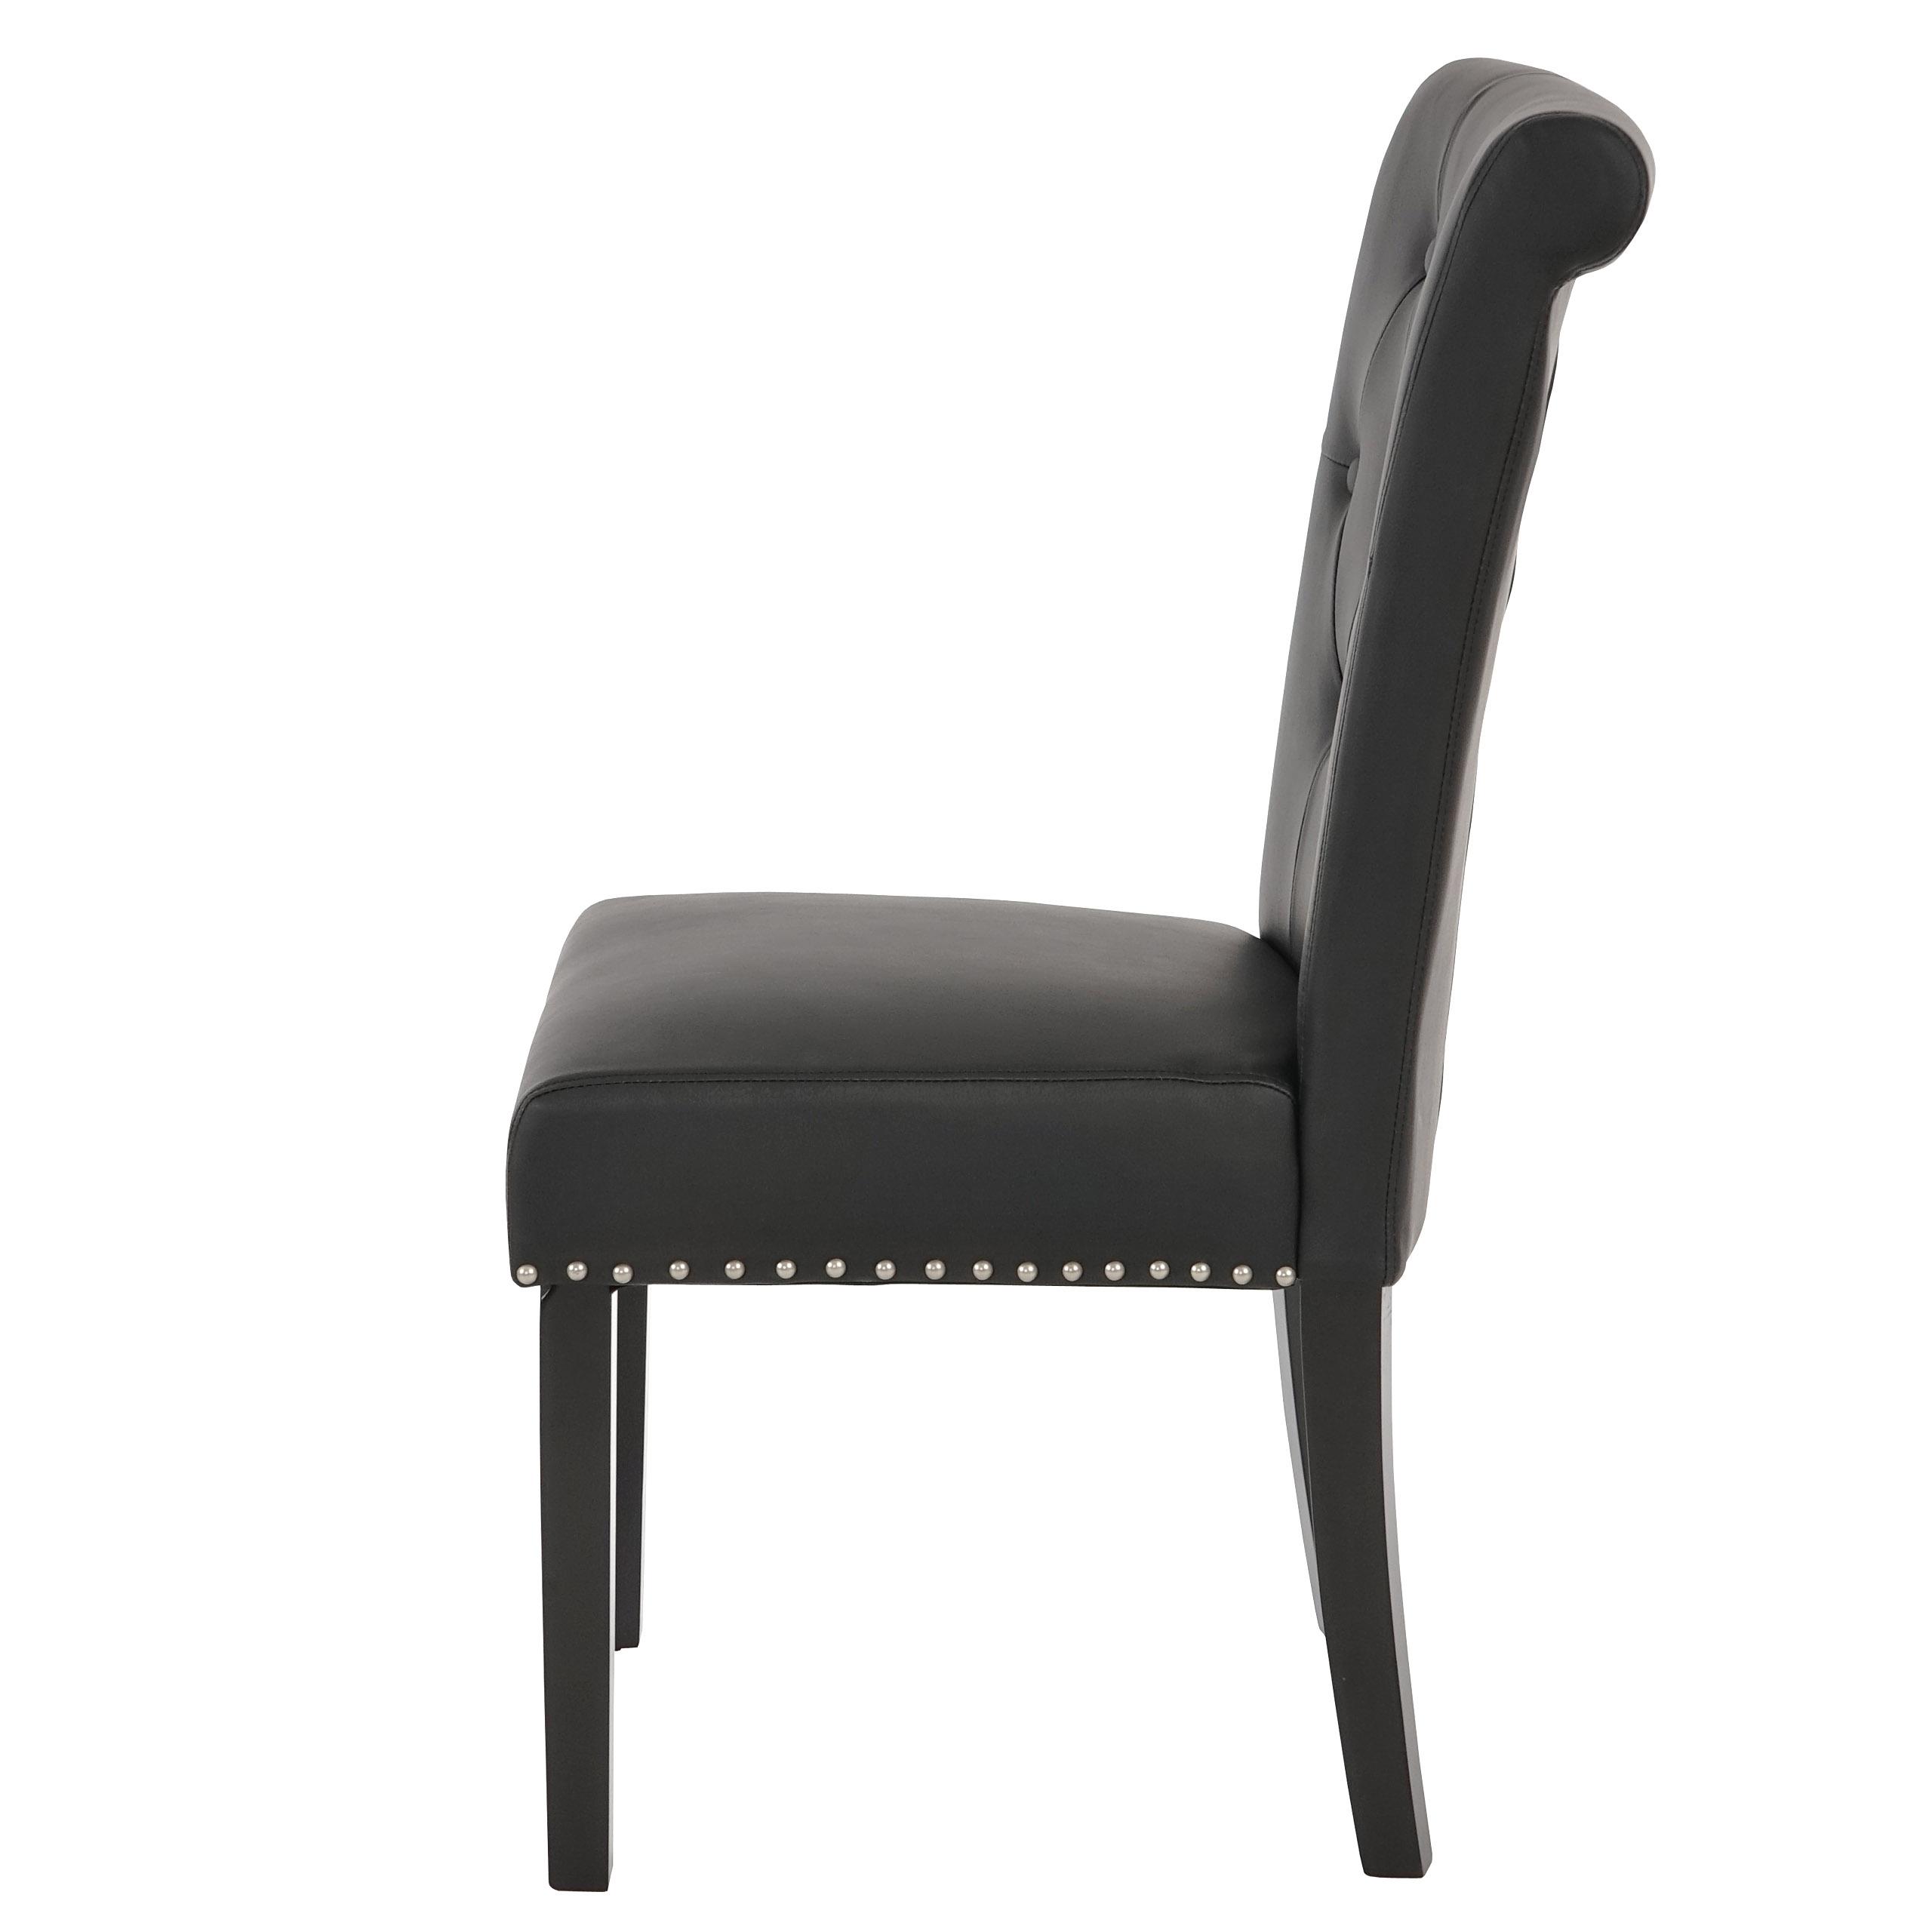 2x esszimmerstuhl chesterfield ii stuhl lehnstuhl nieten kunstleder coffee dunkle beine. Black Bedroom Furniture Sets. Home Design Ideas